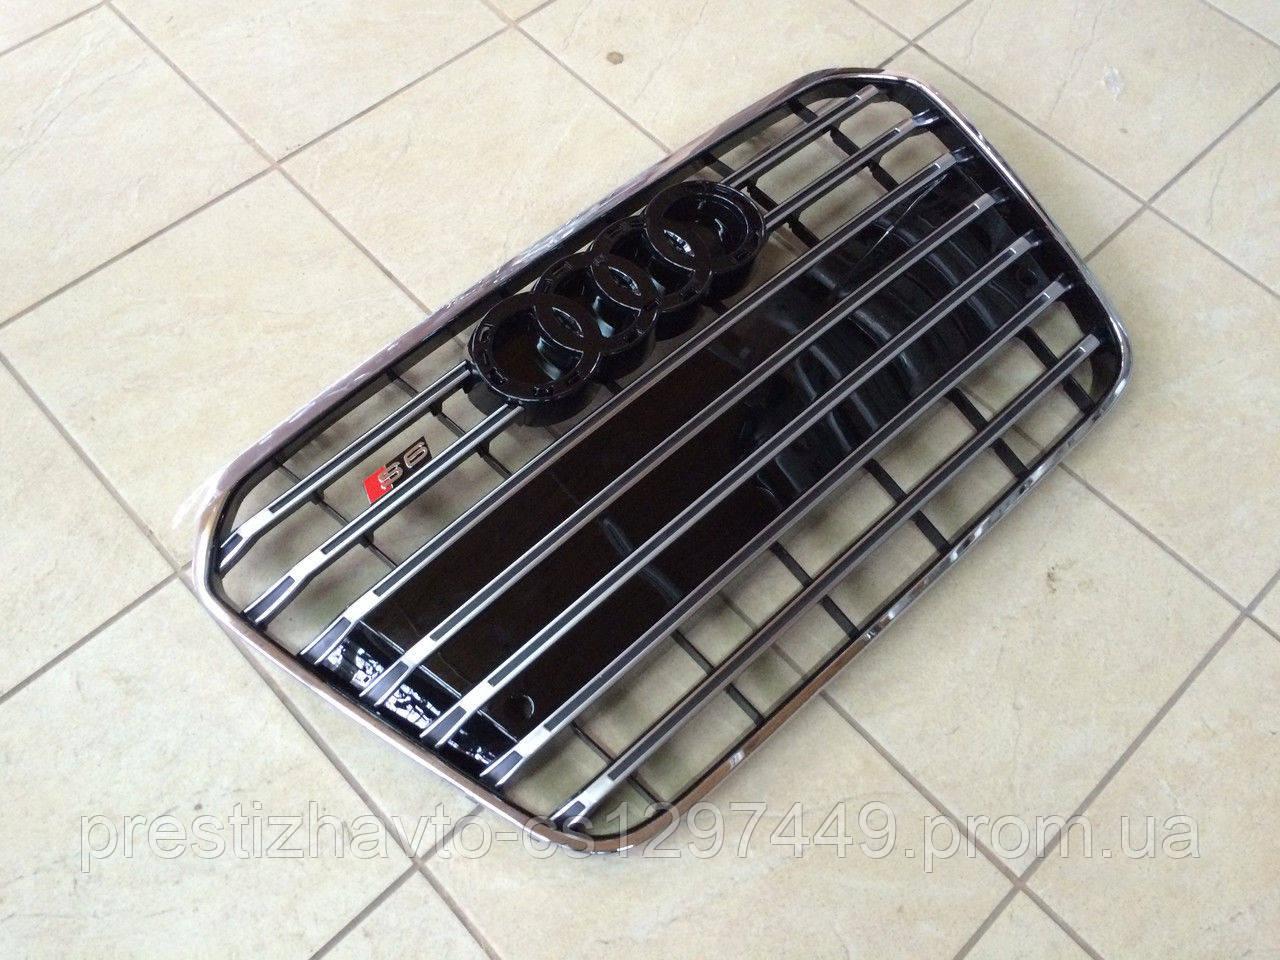 Решетка радиатора на Audi A6 C7 (2012-2015)